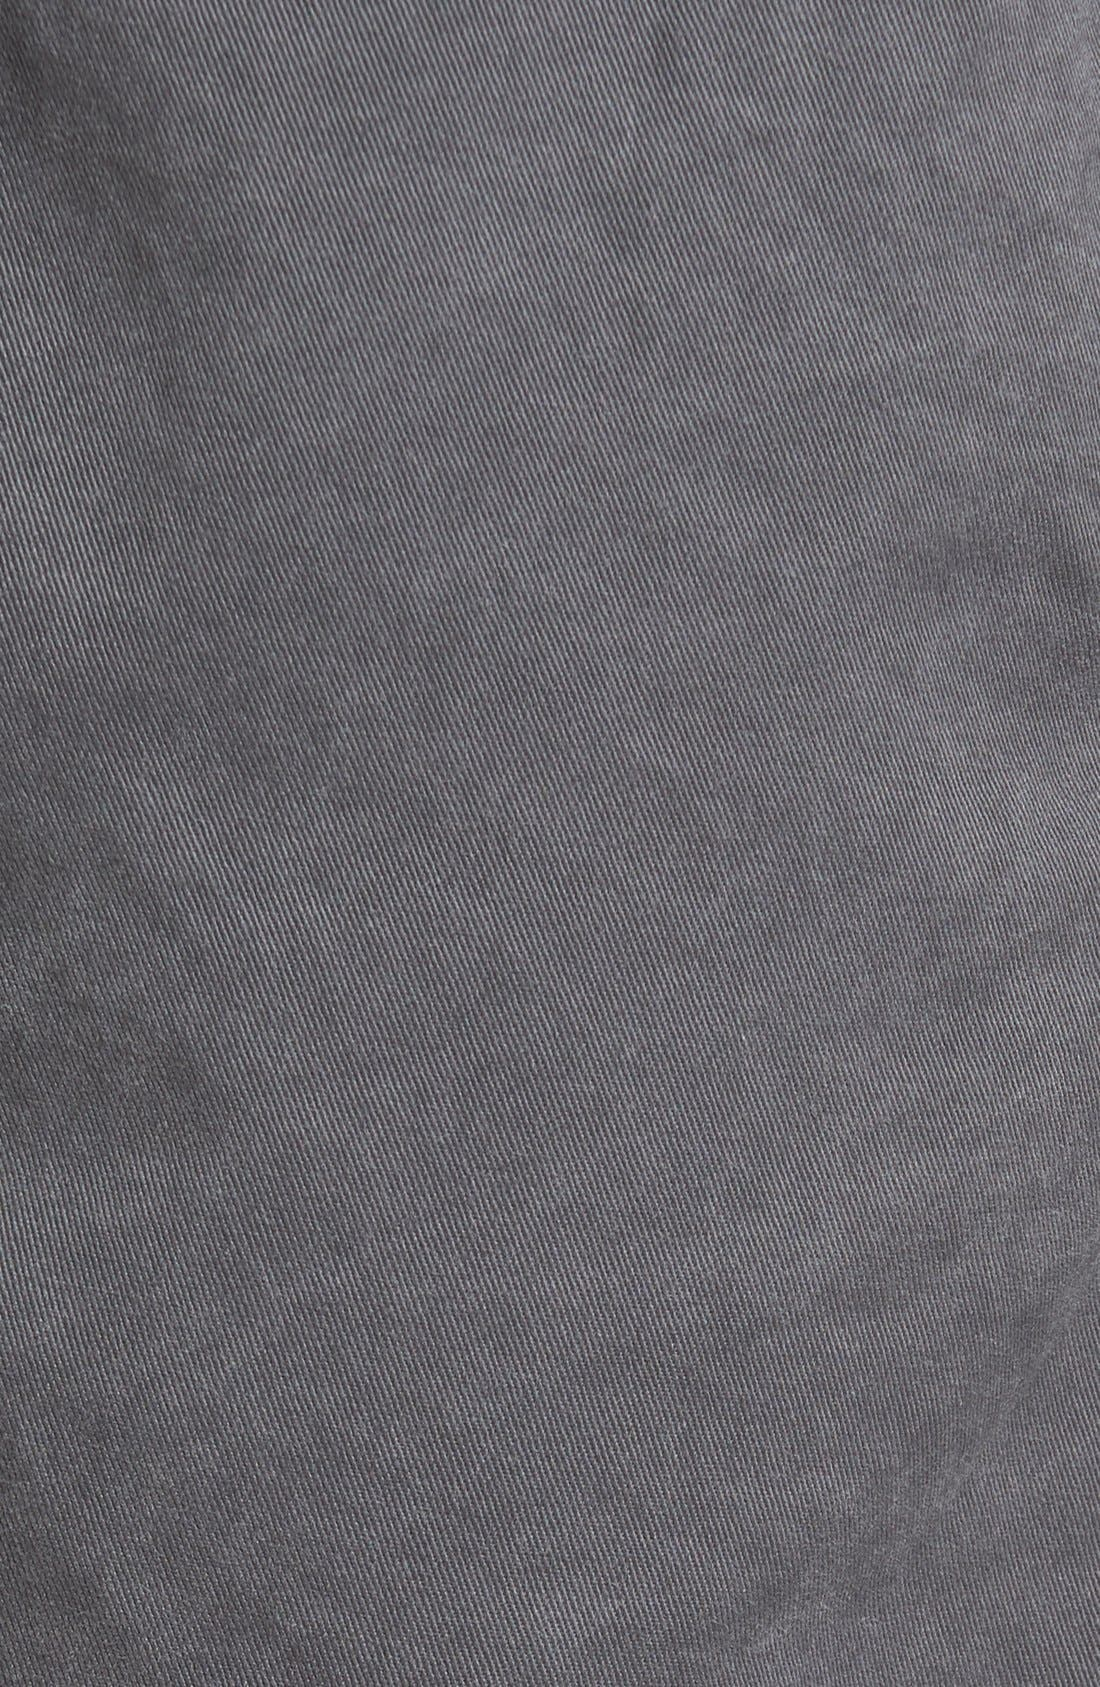 Rockin Sport Shorts,                             Alternate thumbnail 5, color,                             Asphalt Grey